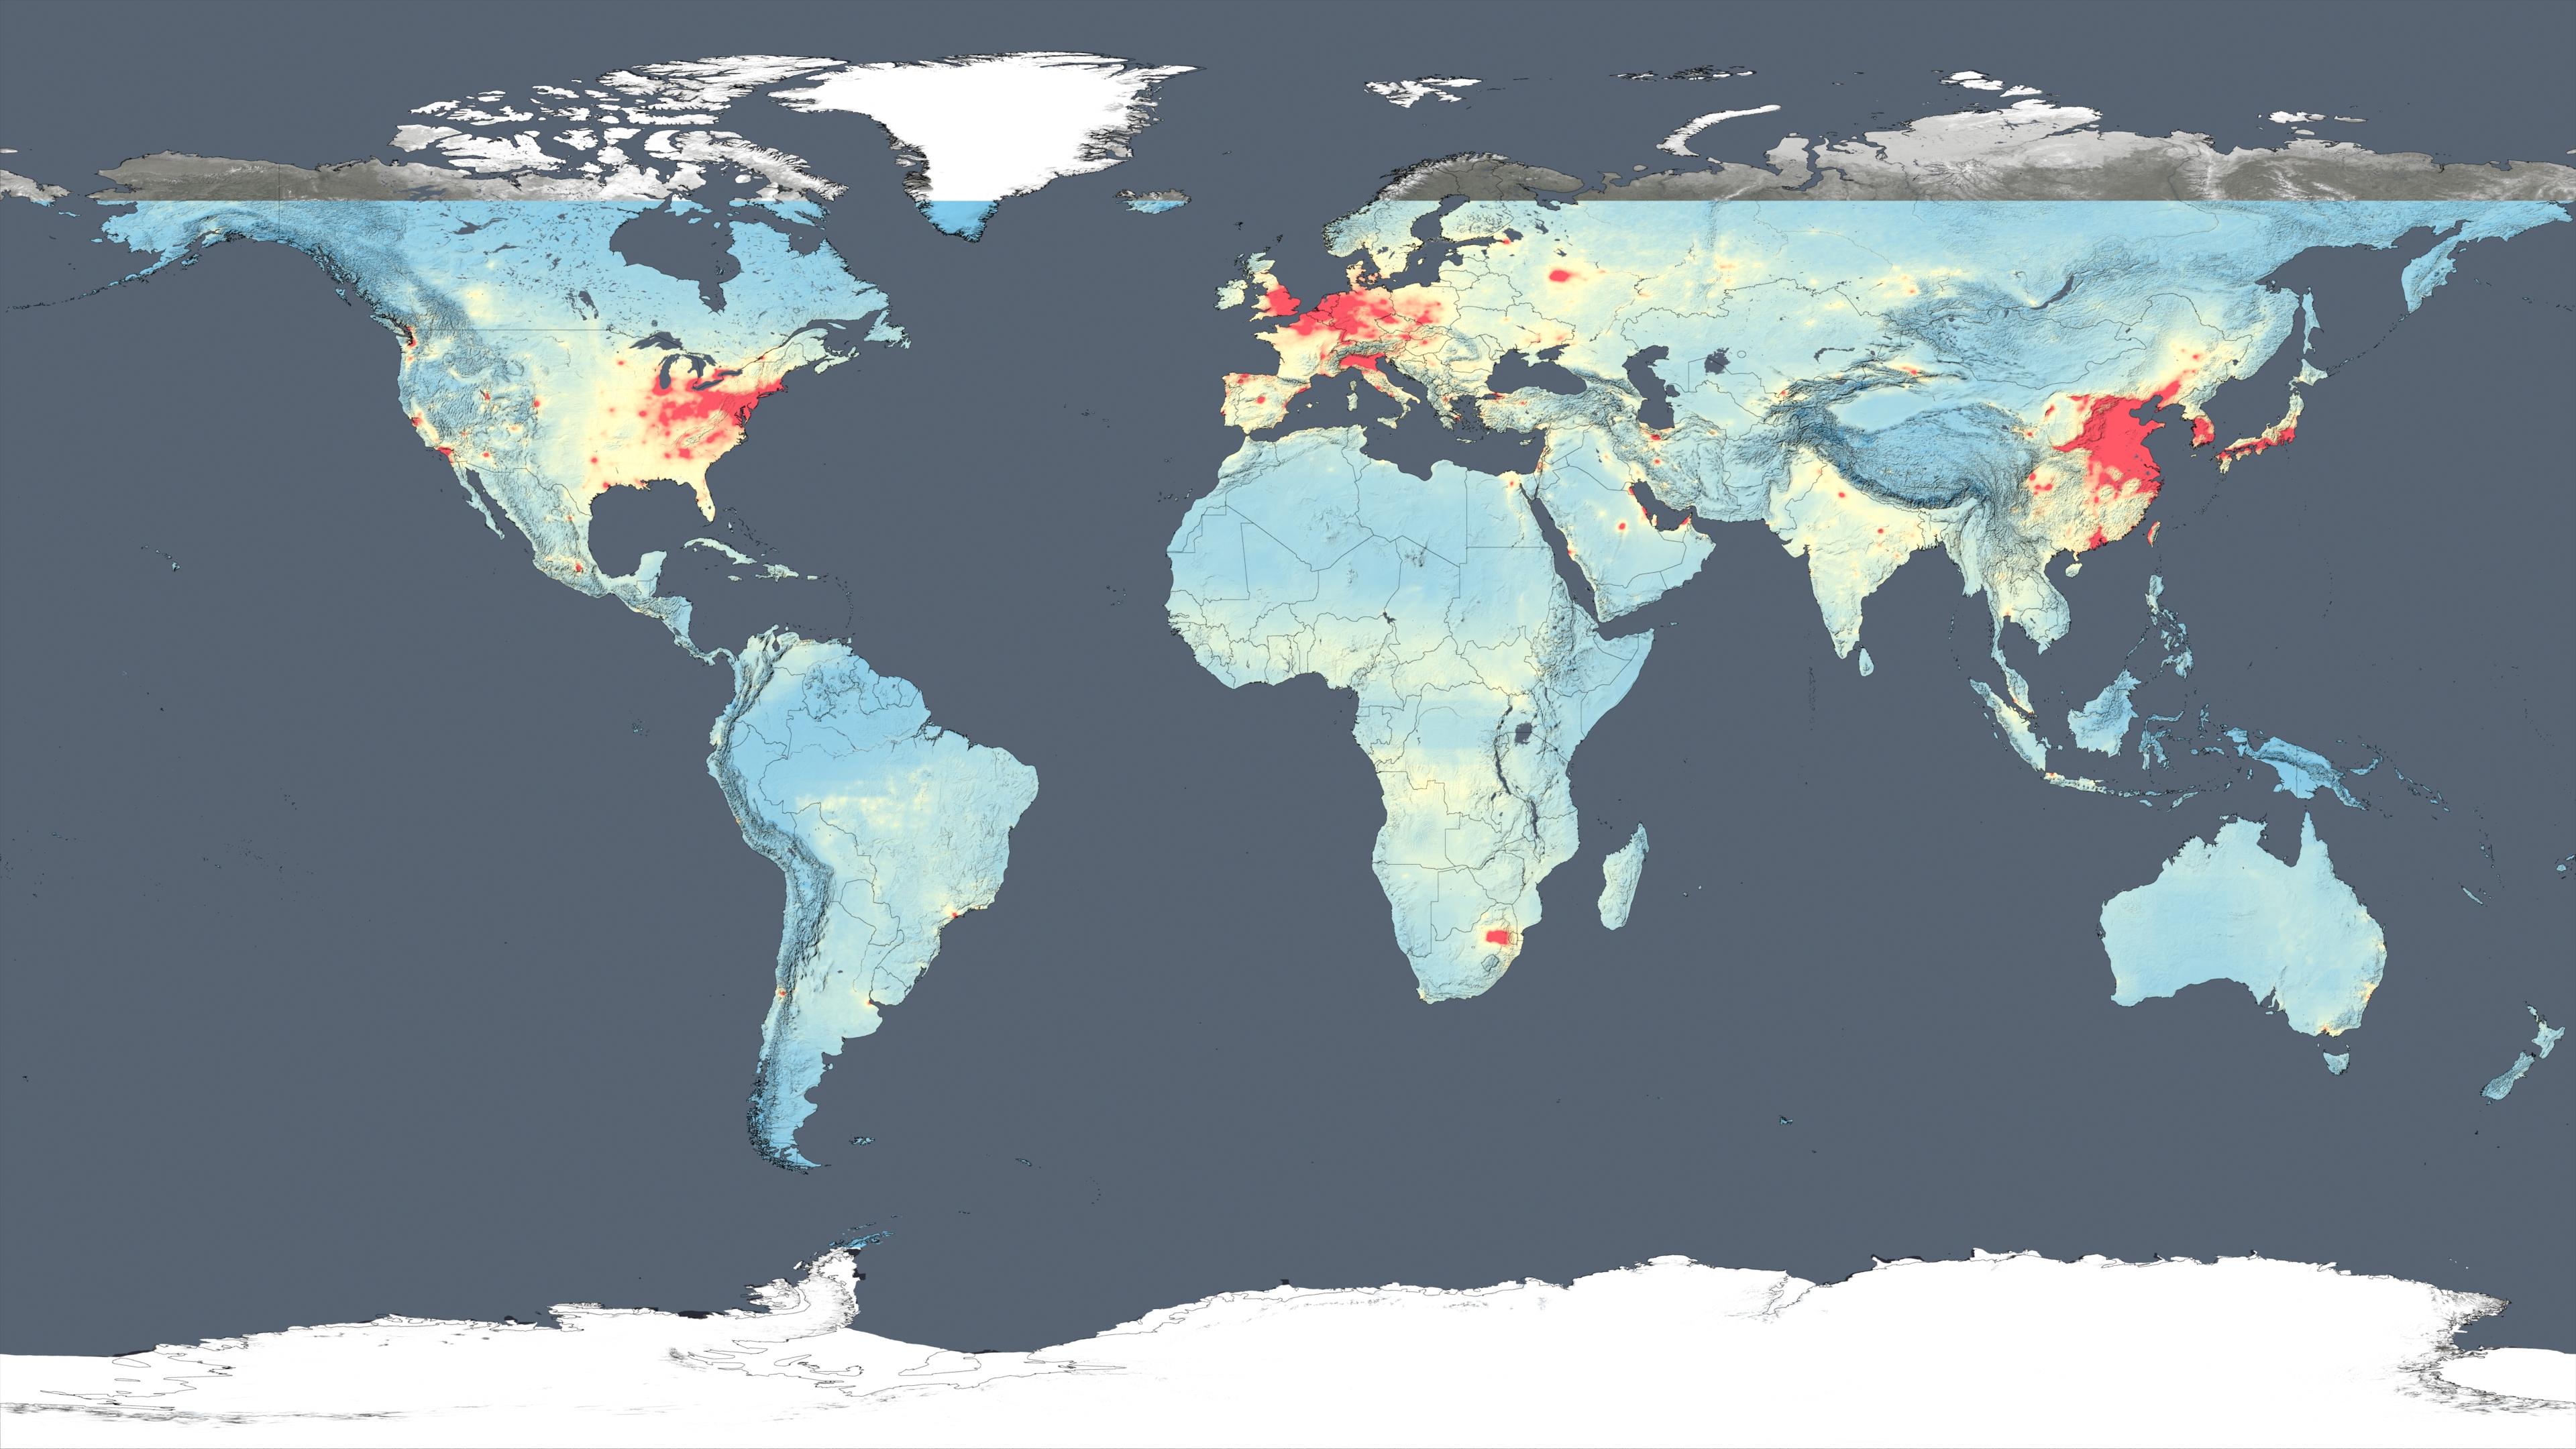 Gms Nasa Images Show Human Fingerprint On Global Air